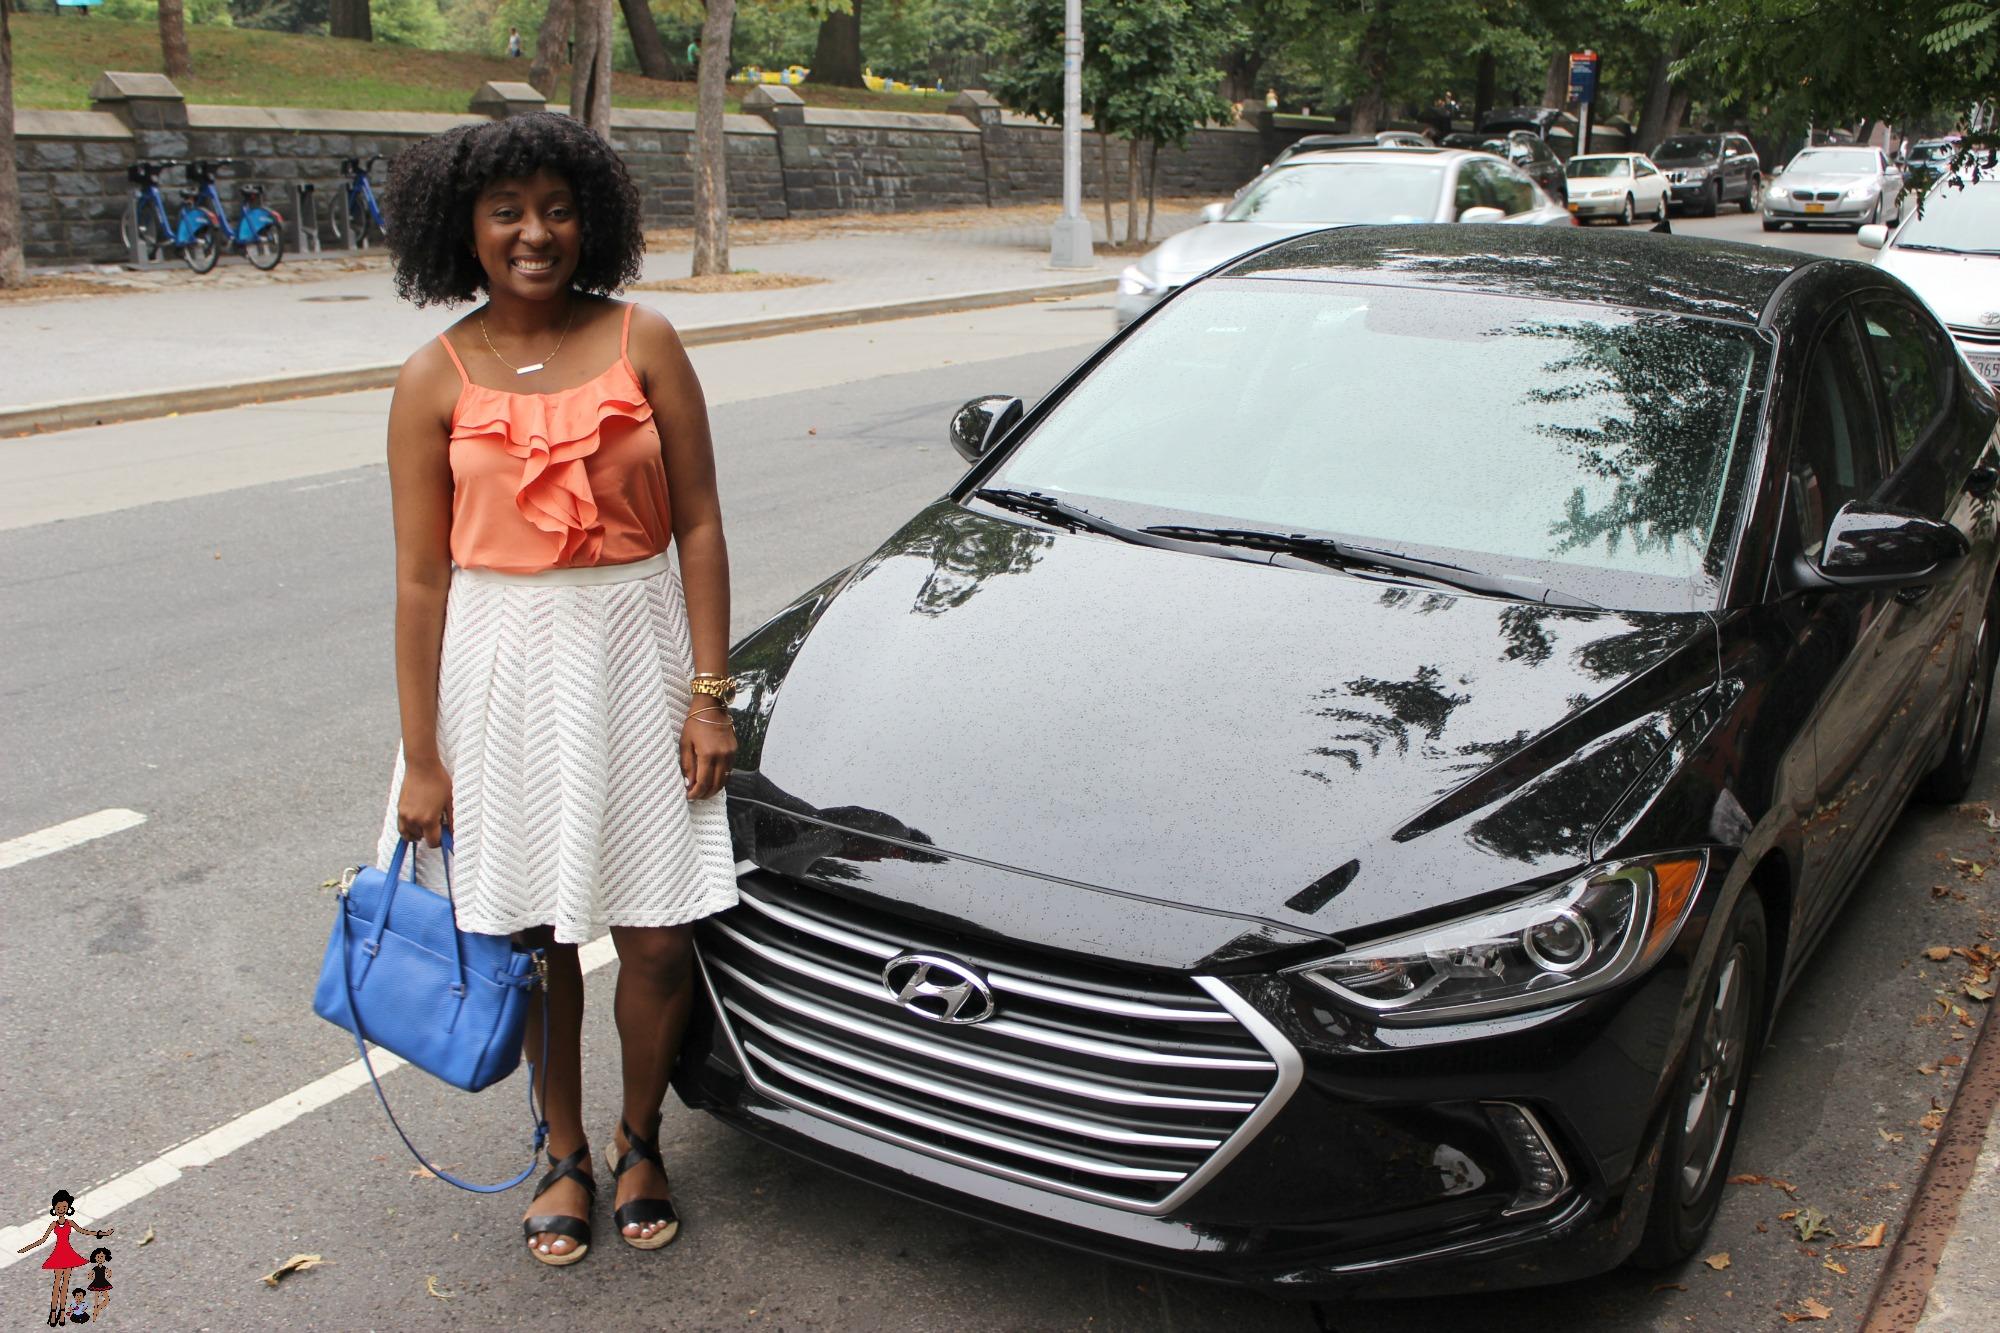 2017 Hyundai Elantra Eco Aka The Black Car Rattles Heels